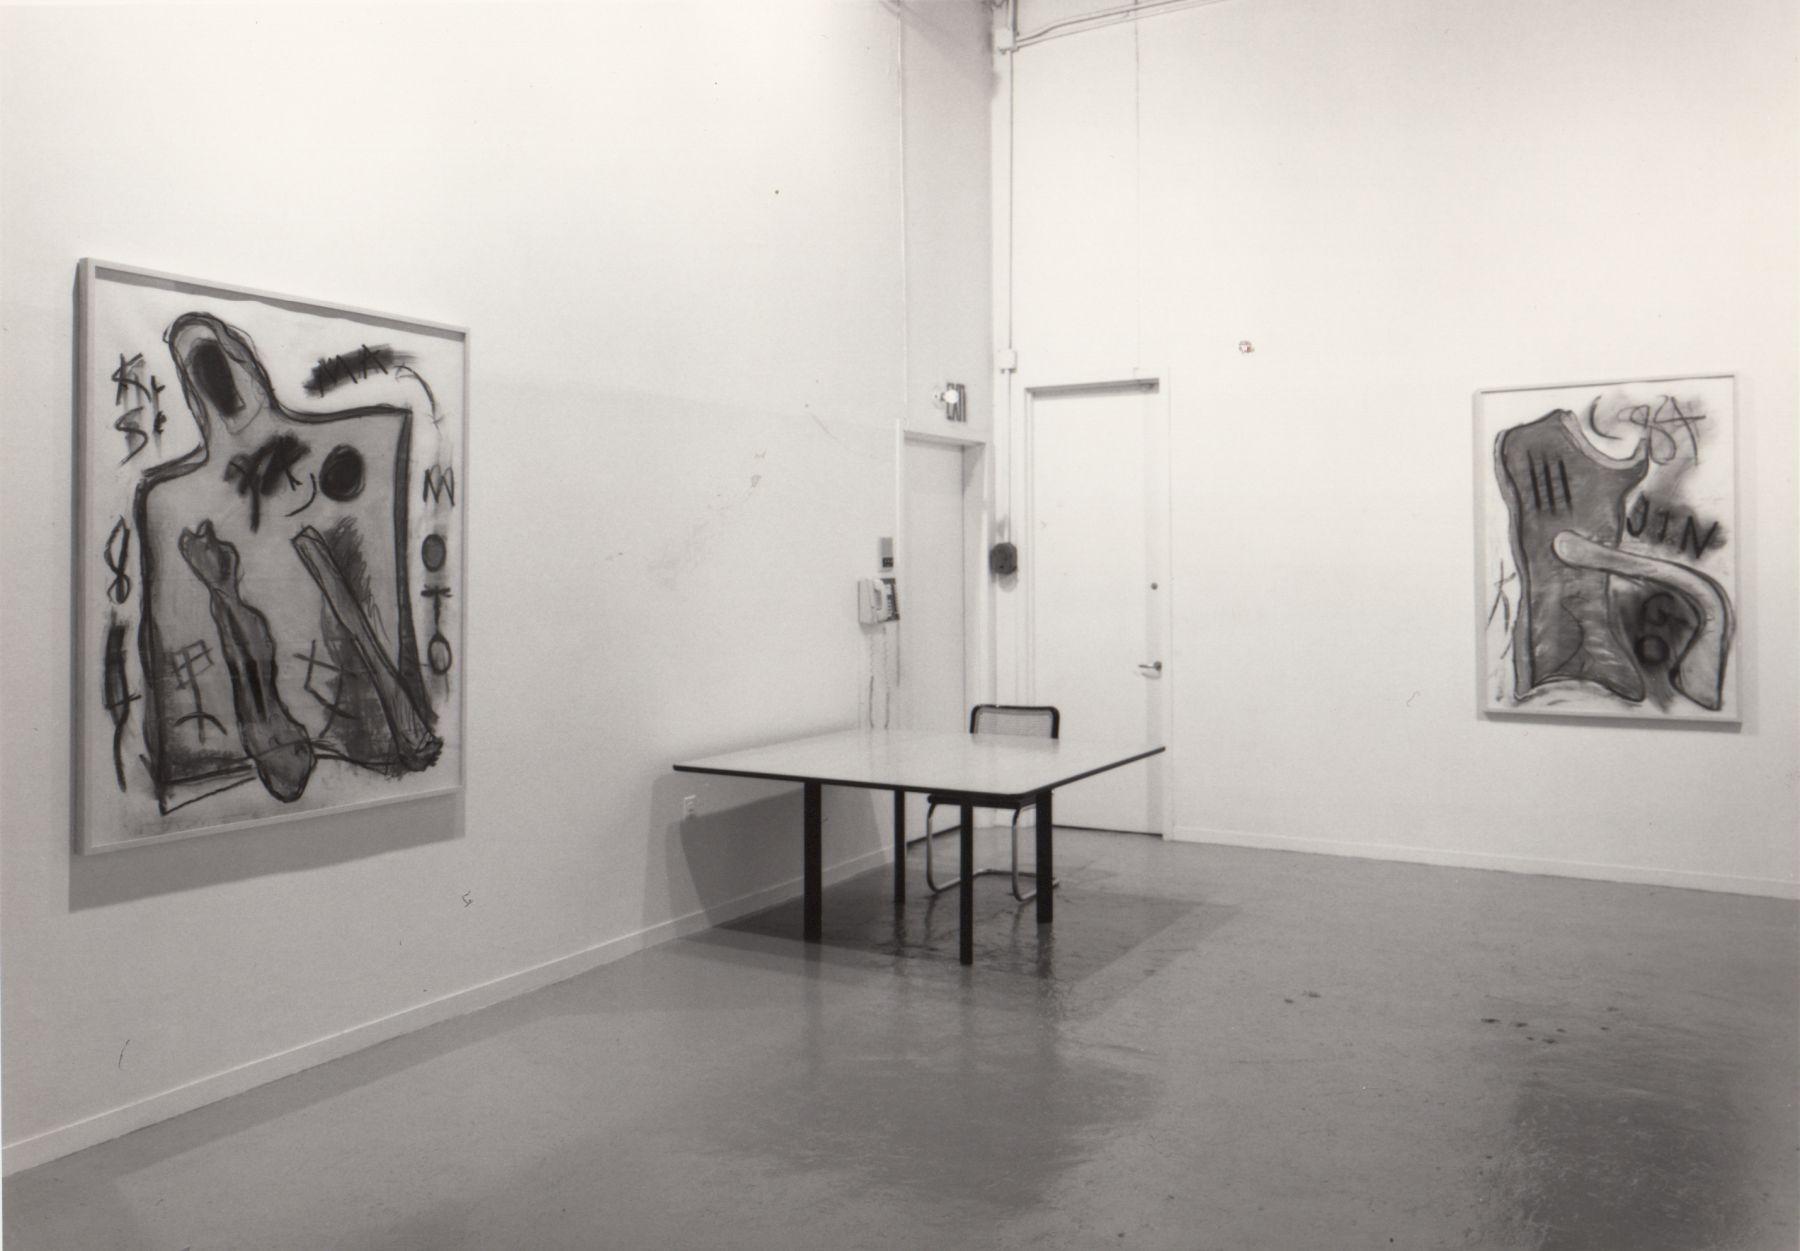 Installation view, Keith Sonnier, 142 GREENE